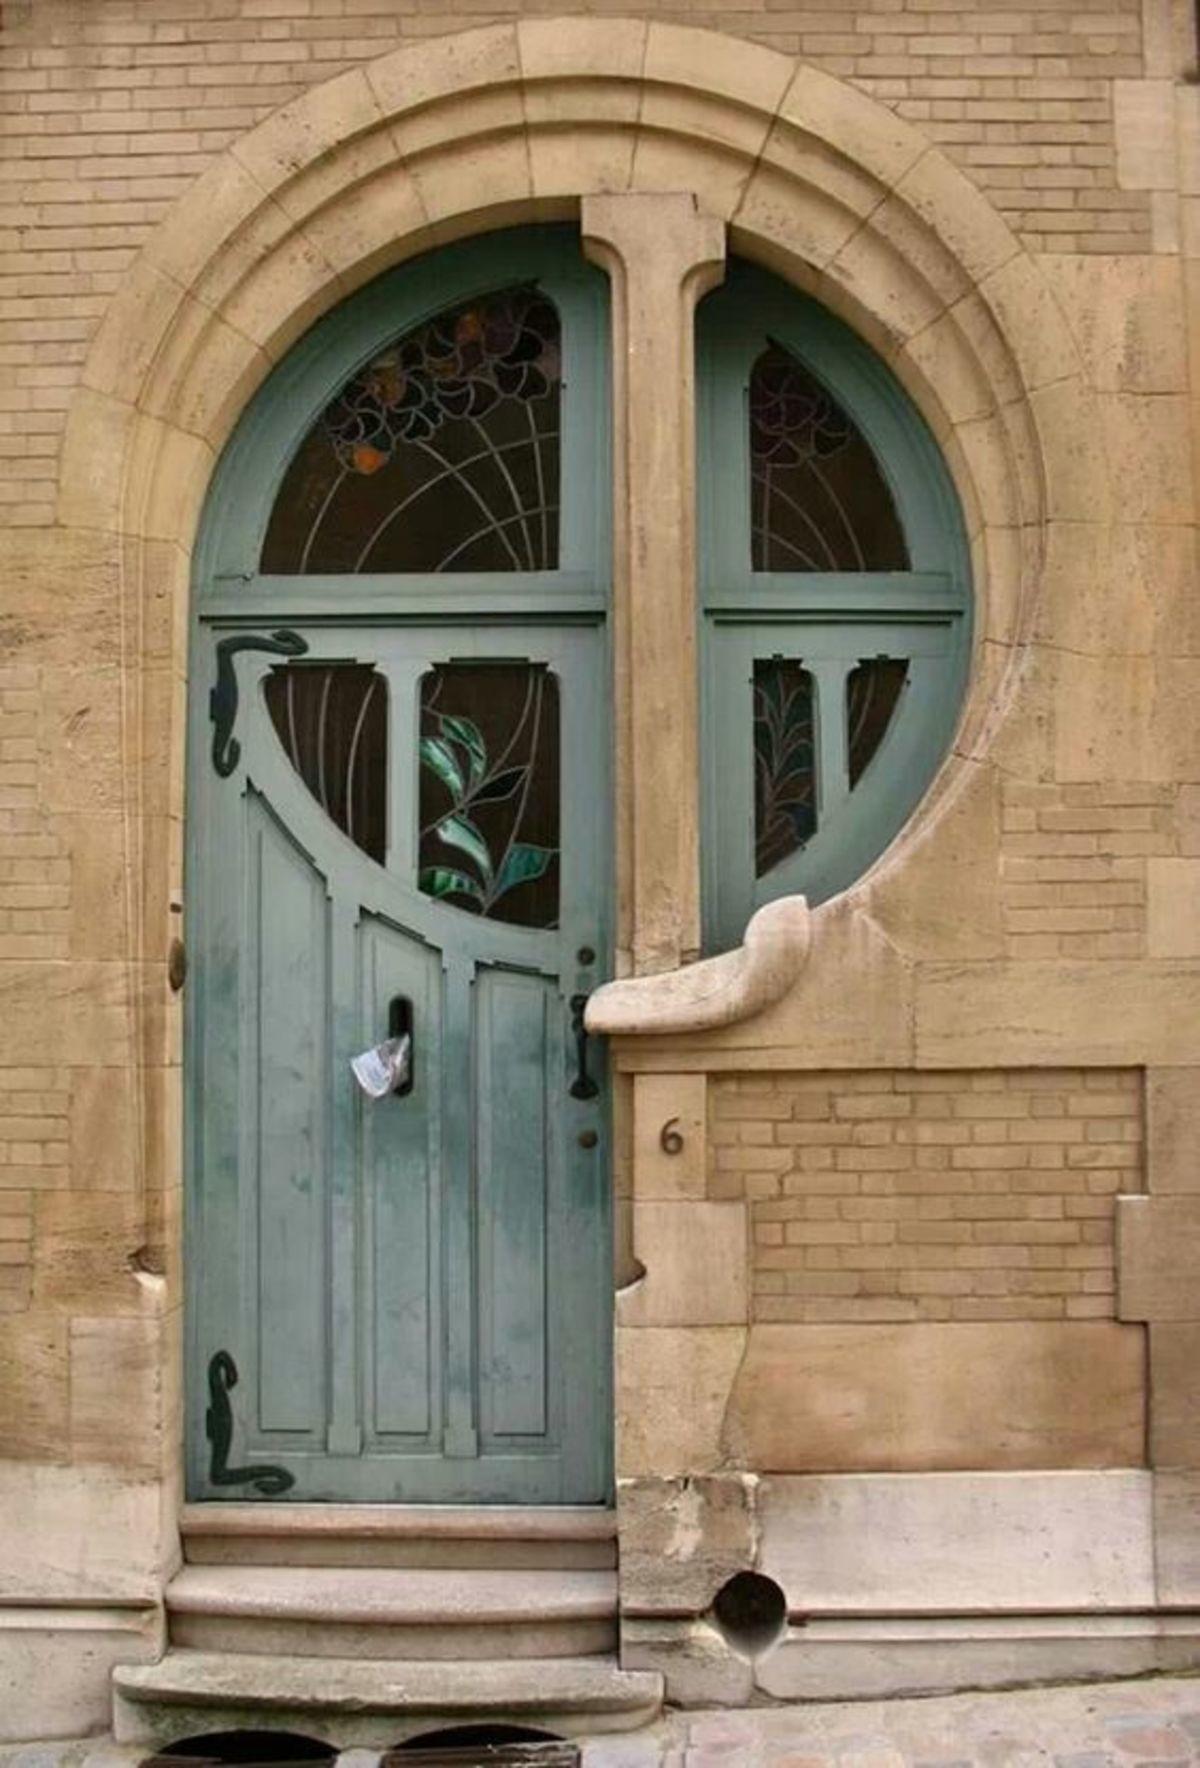 & Awesome doors pezcame.com